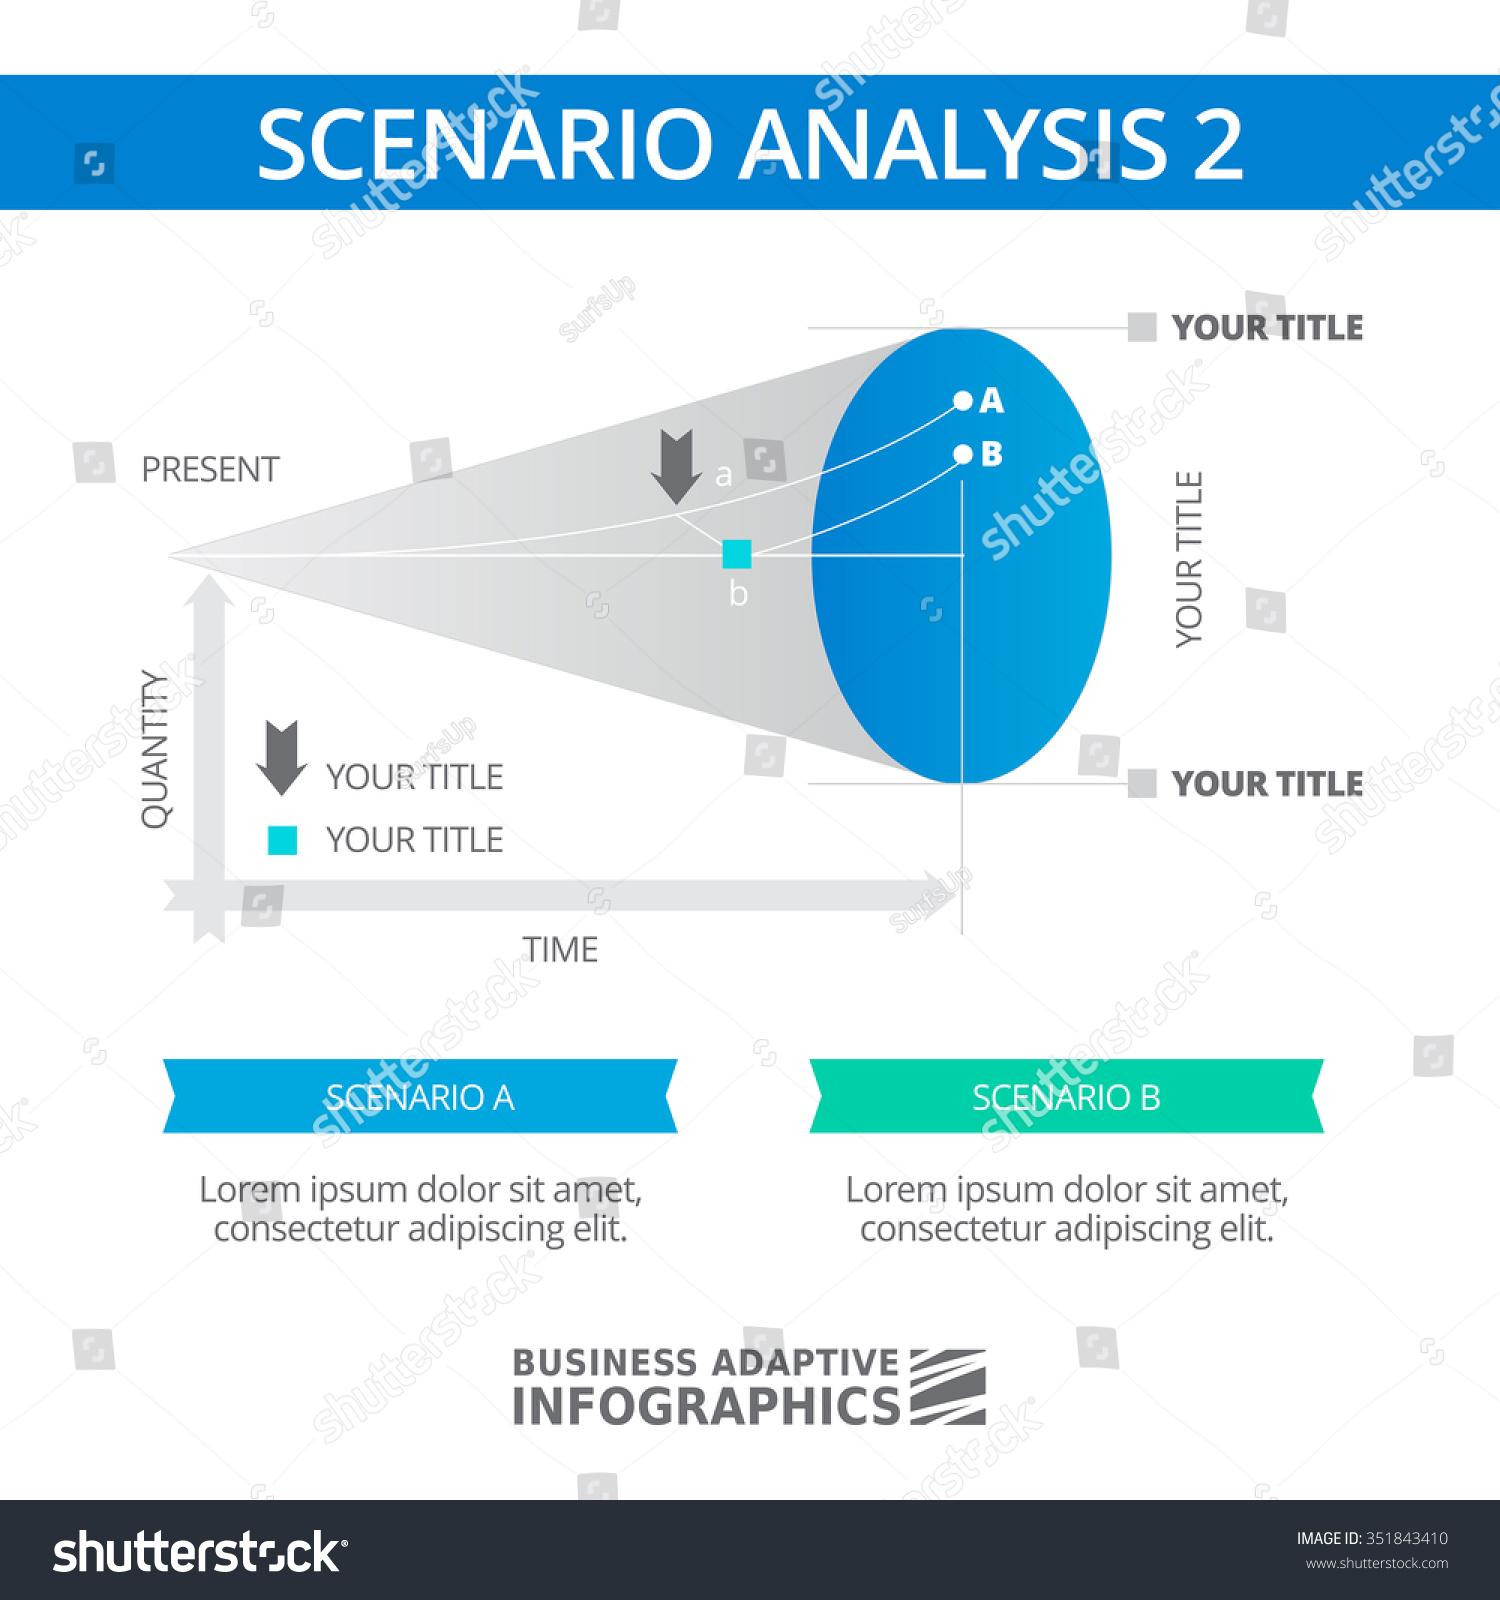 Editable Infographic Template Scenario Analysis Diagram Stock Vector ...